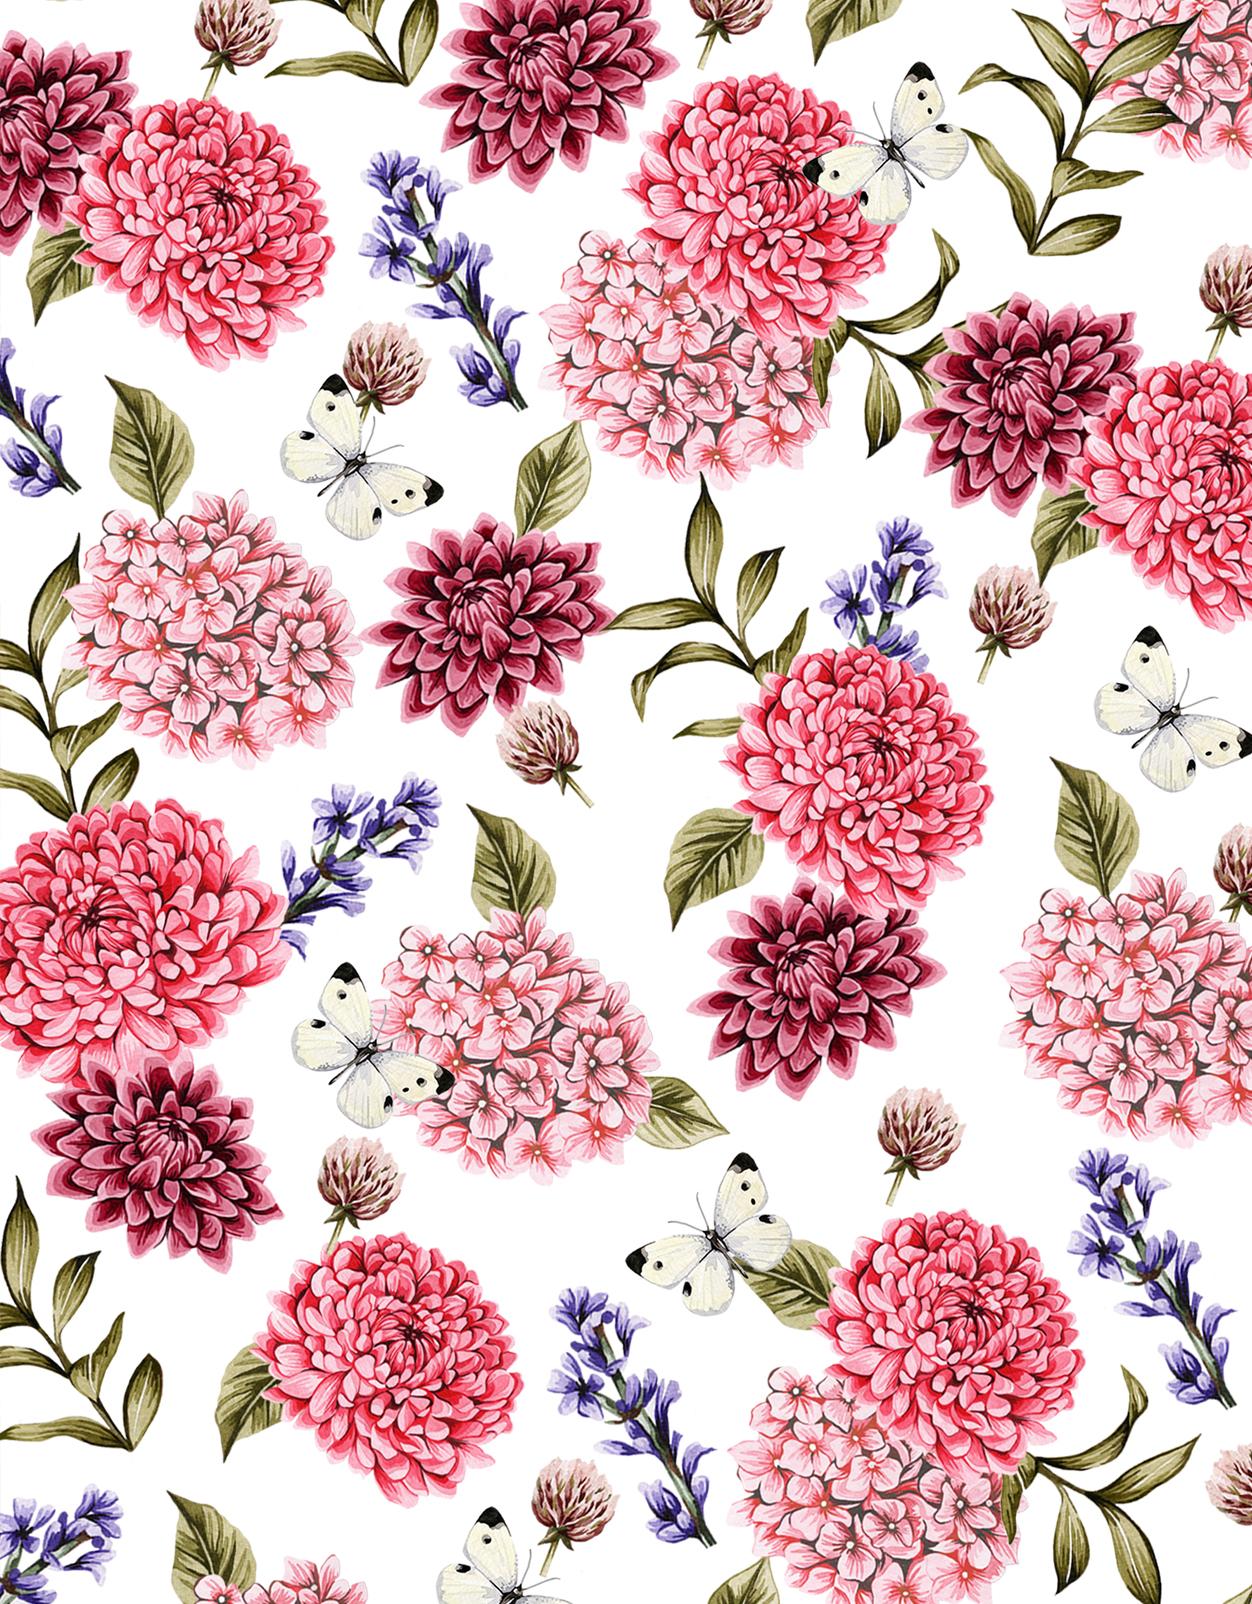 Summer Floral.jpg